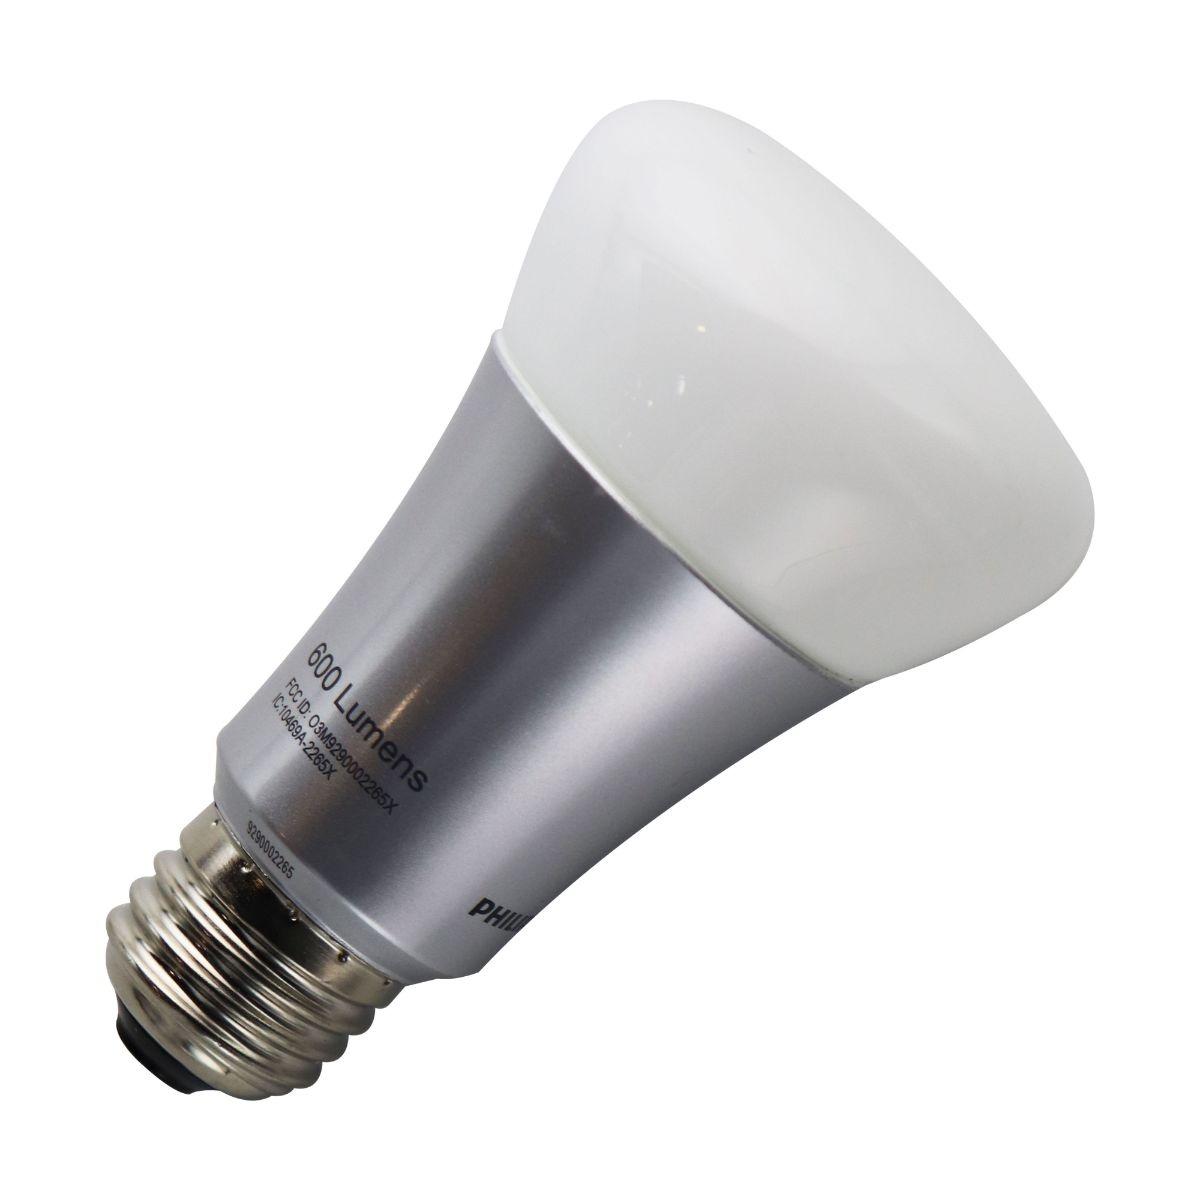 Philips Hue Personal Wireless Lighting - Single Bulb (426361)